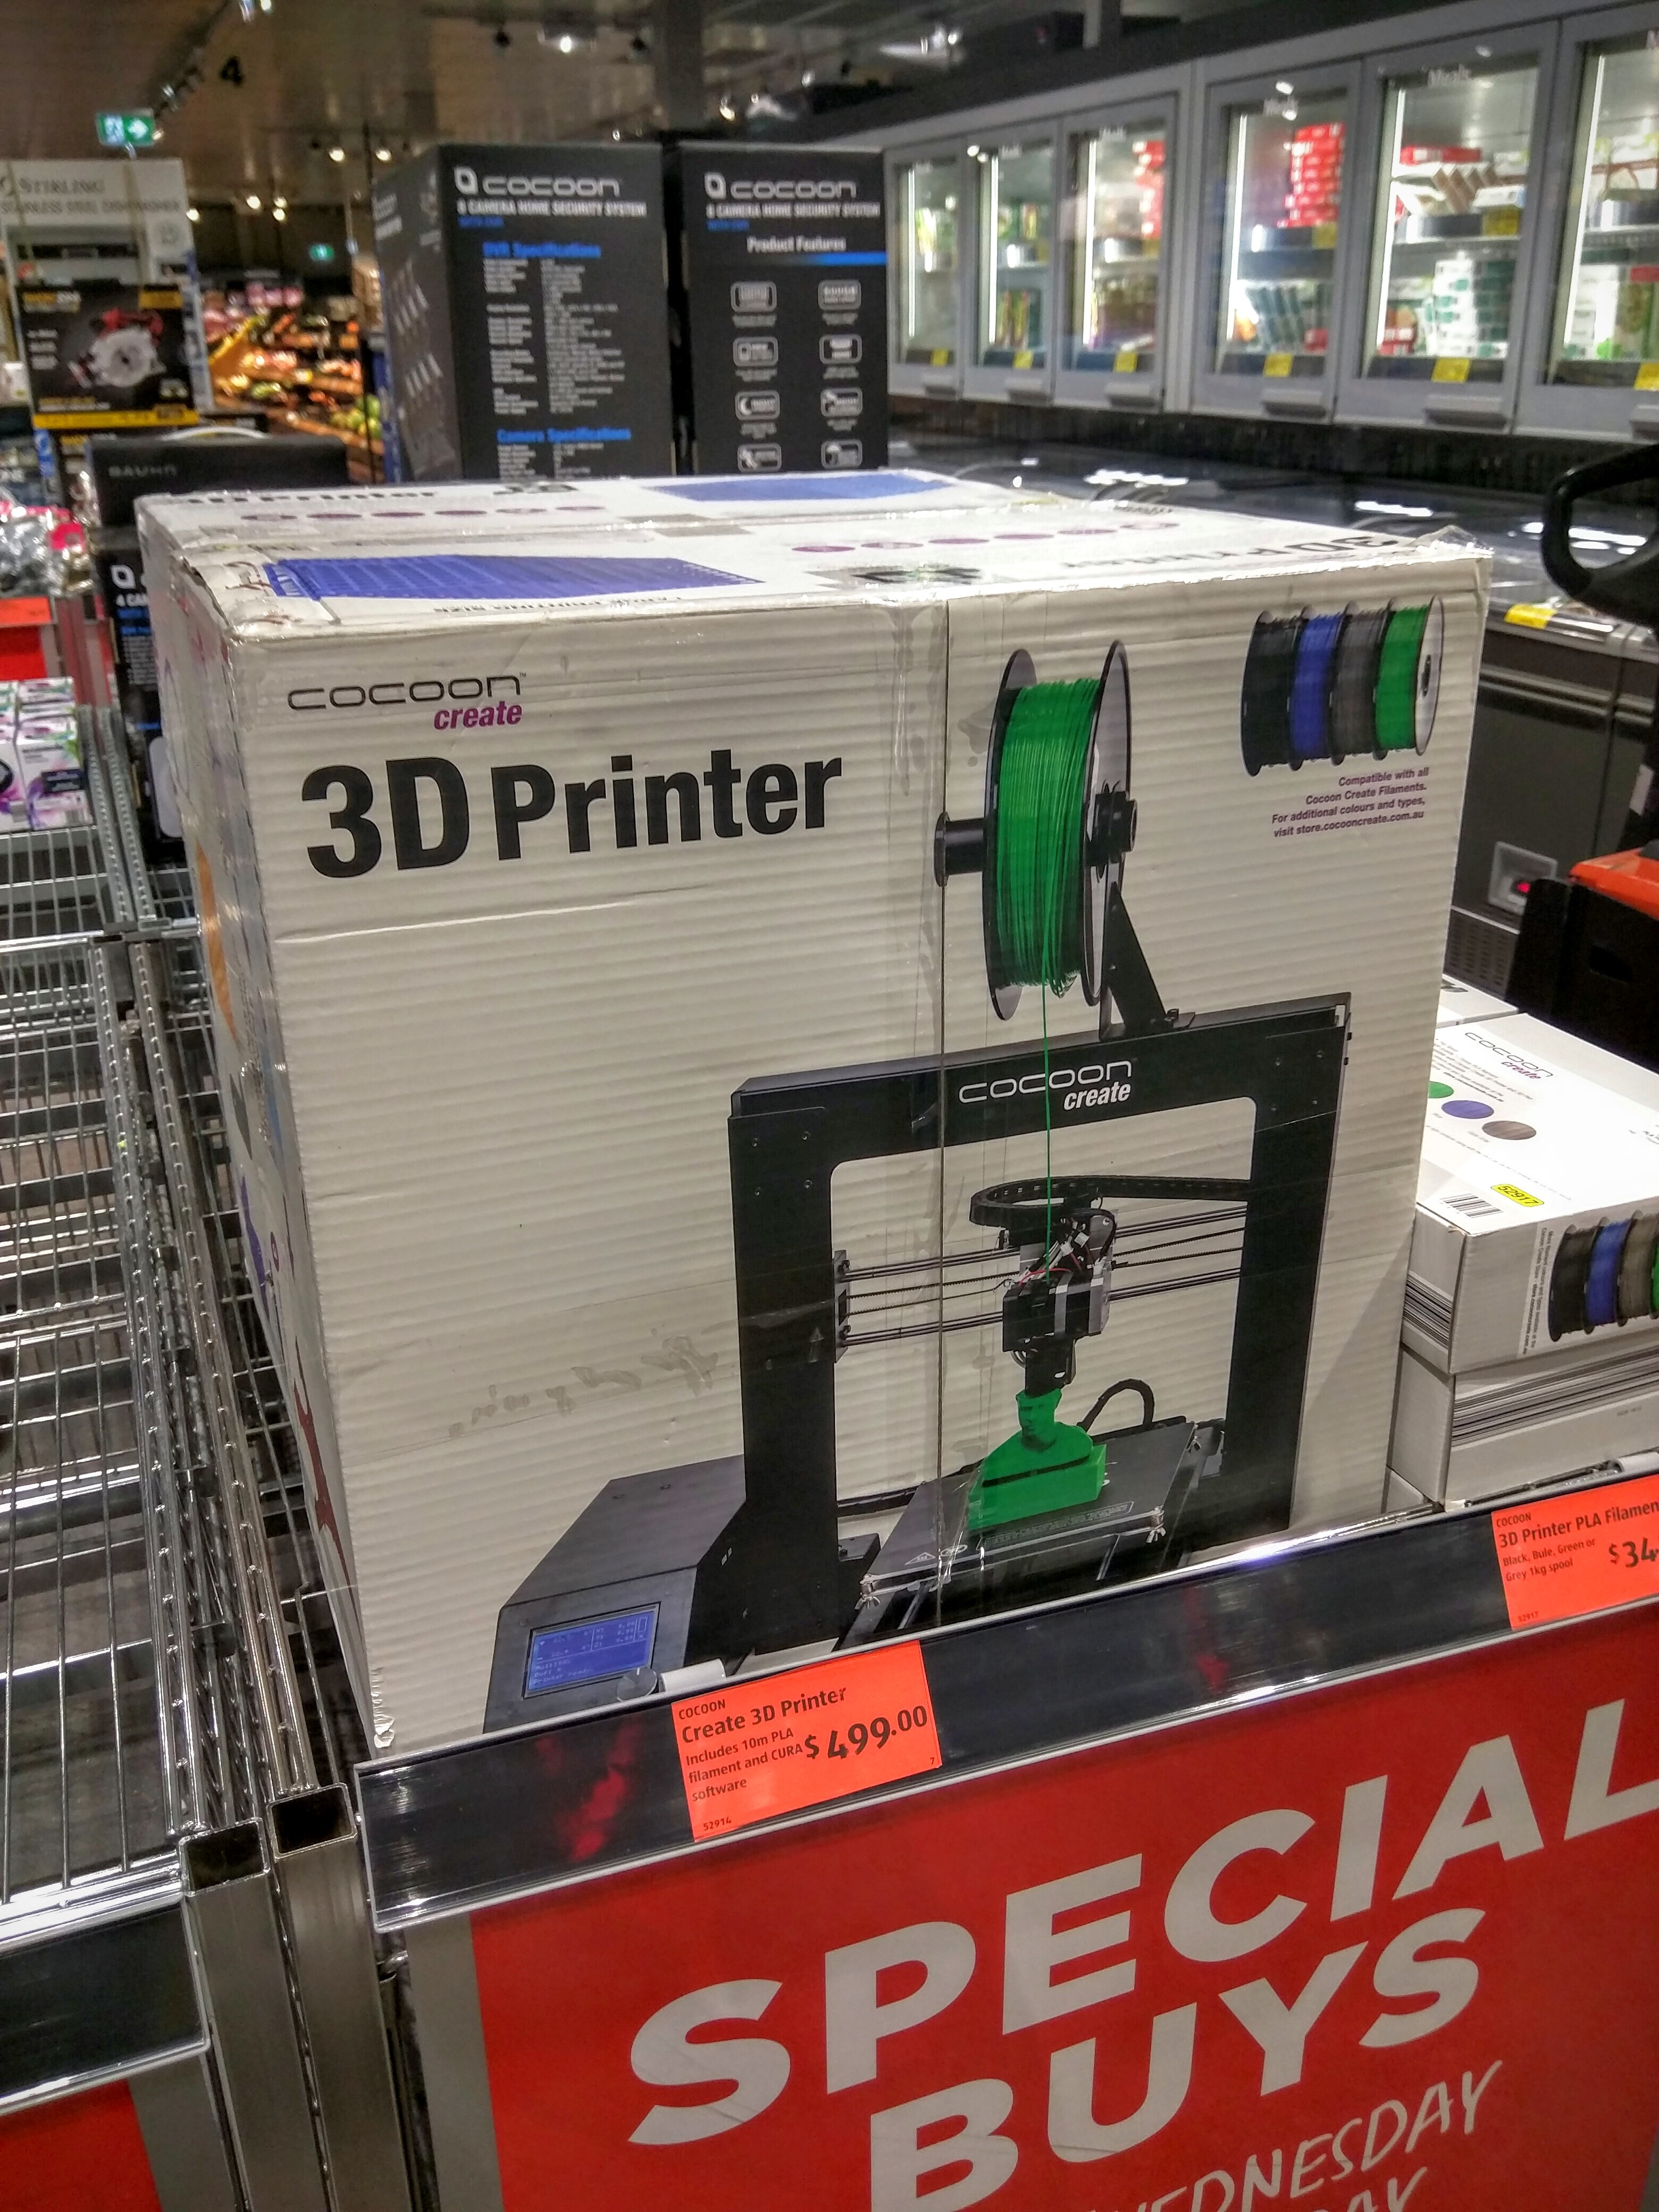 3d Printer For Sale >> File 3d Printer On Sale At Aldi Supermarket Jpg Wikimedia